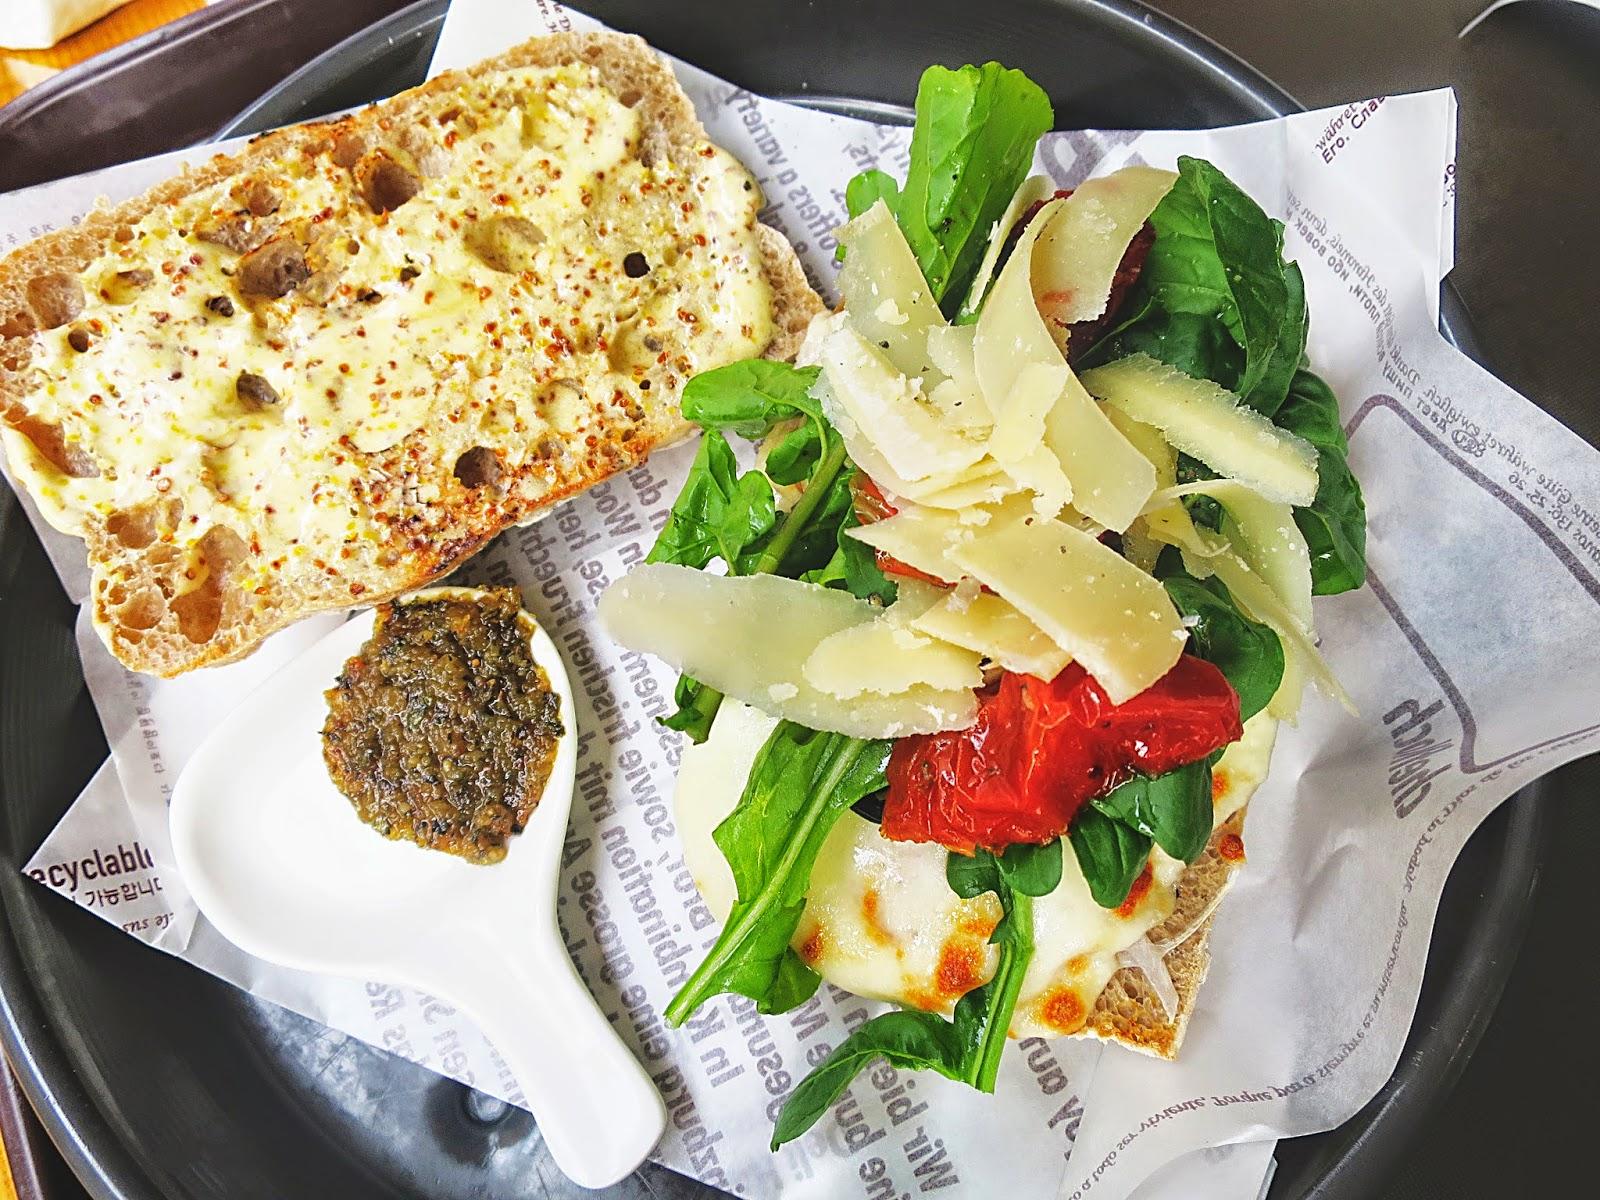 photo of the Pizza Panini served at Deli Heinzburg